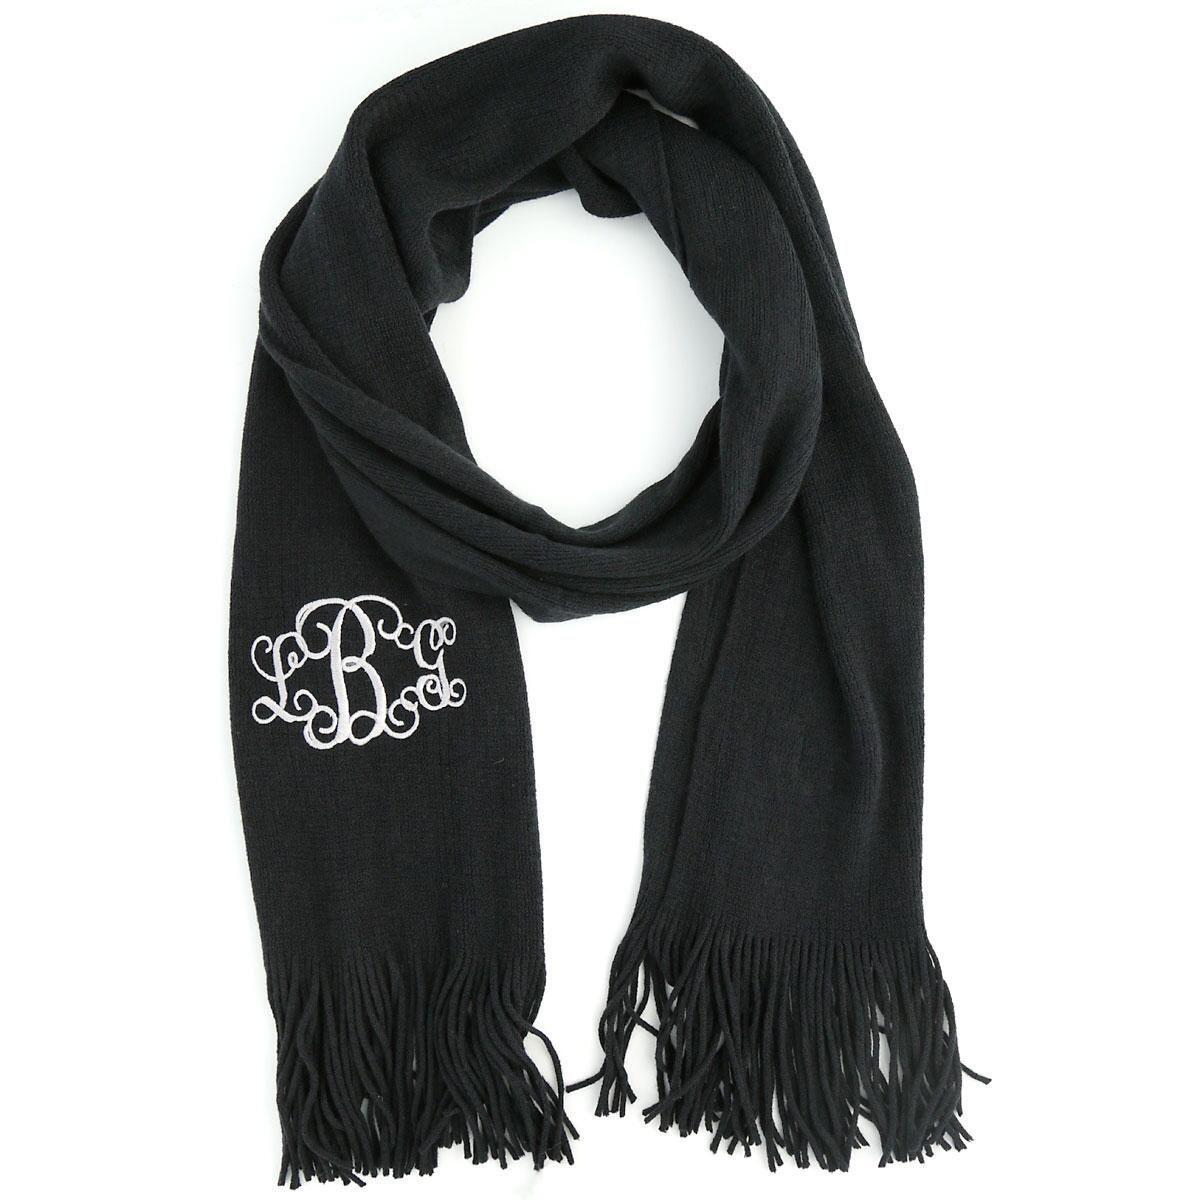 Monogram Knit Scarf - 3 Designs